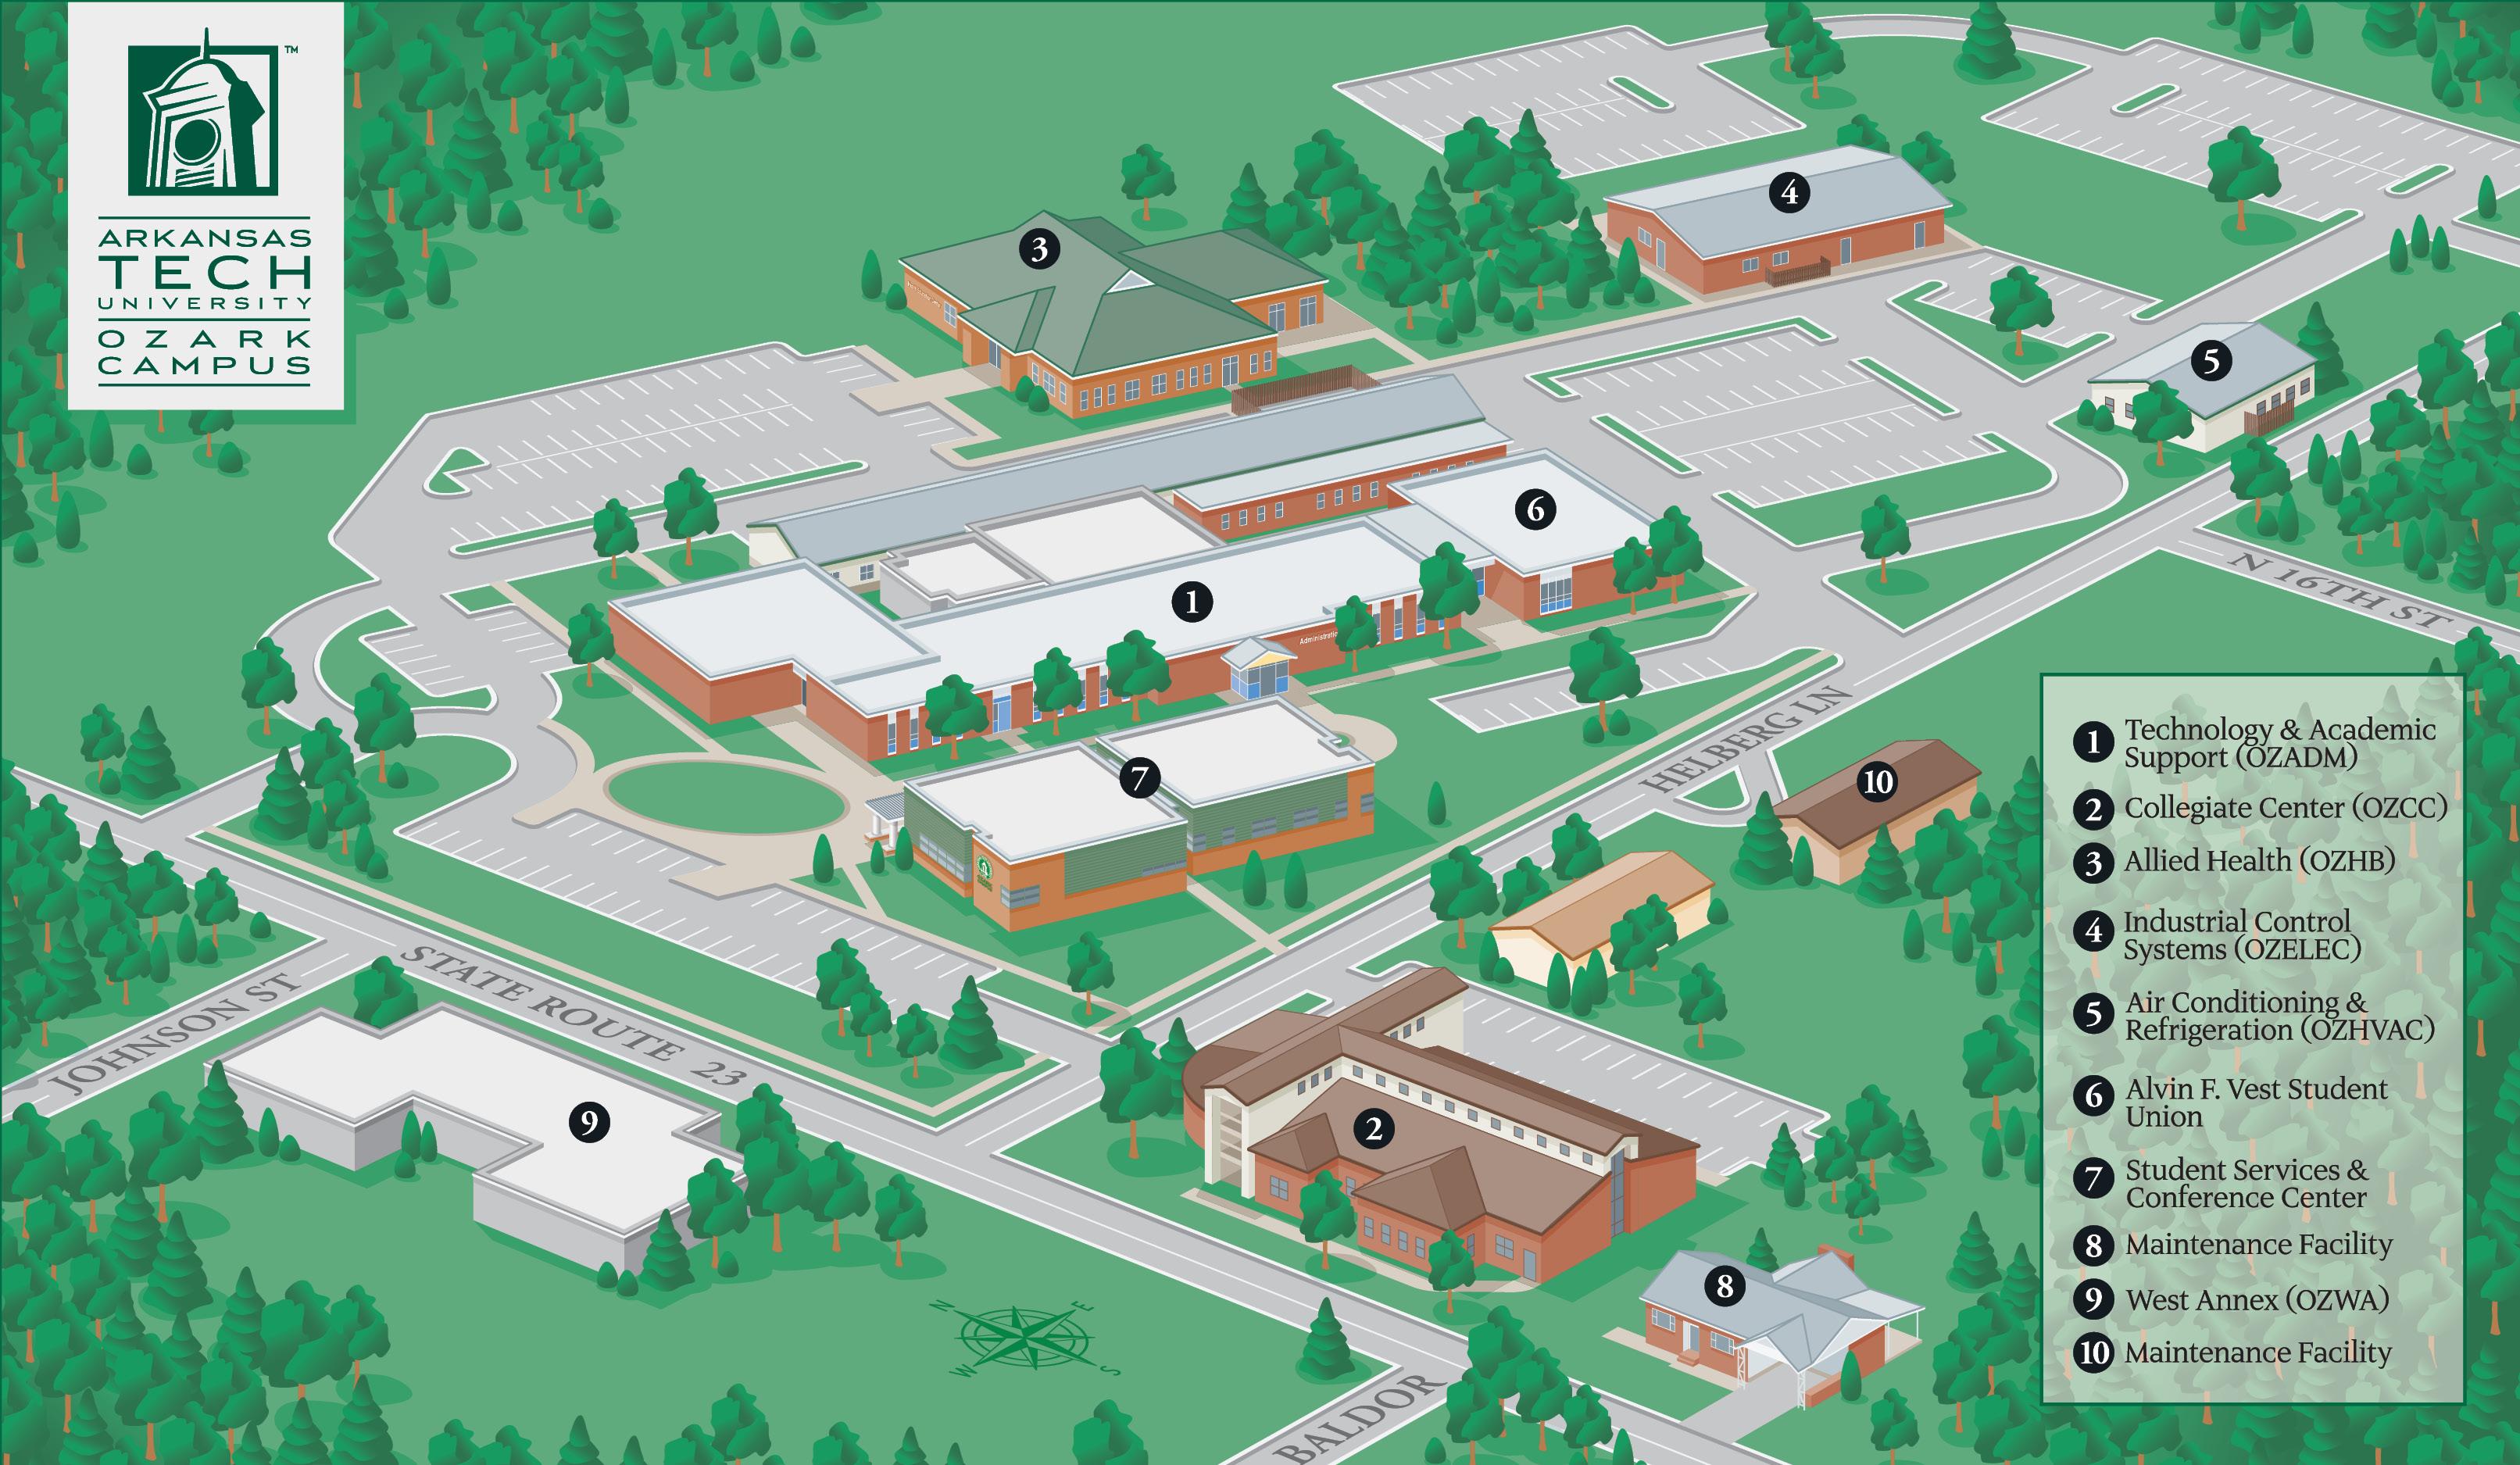 Visit Campus Arkansas Tech University